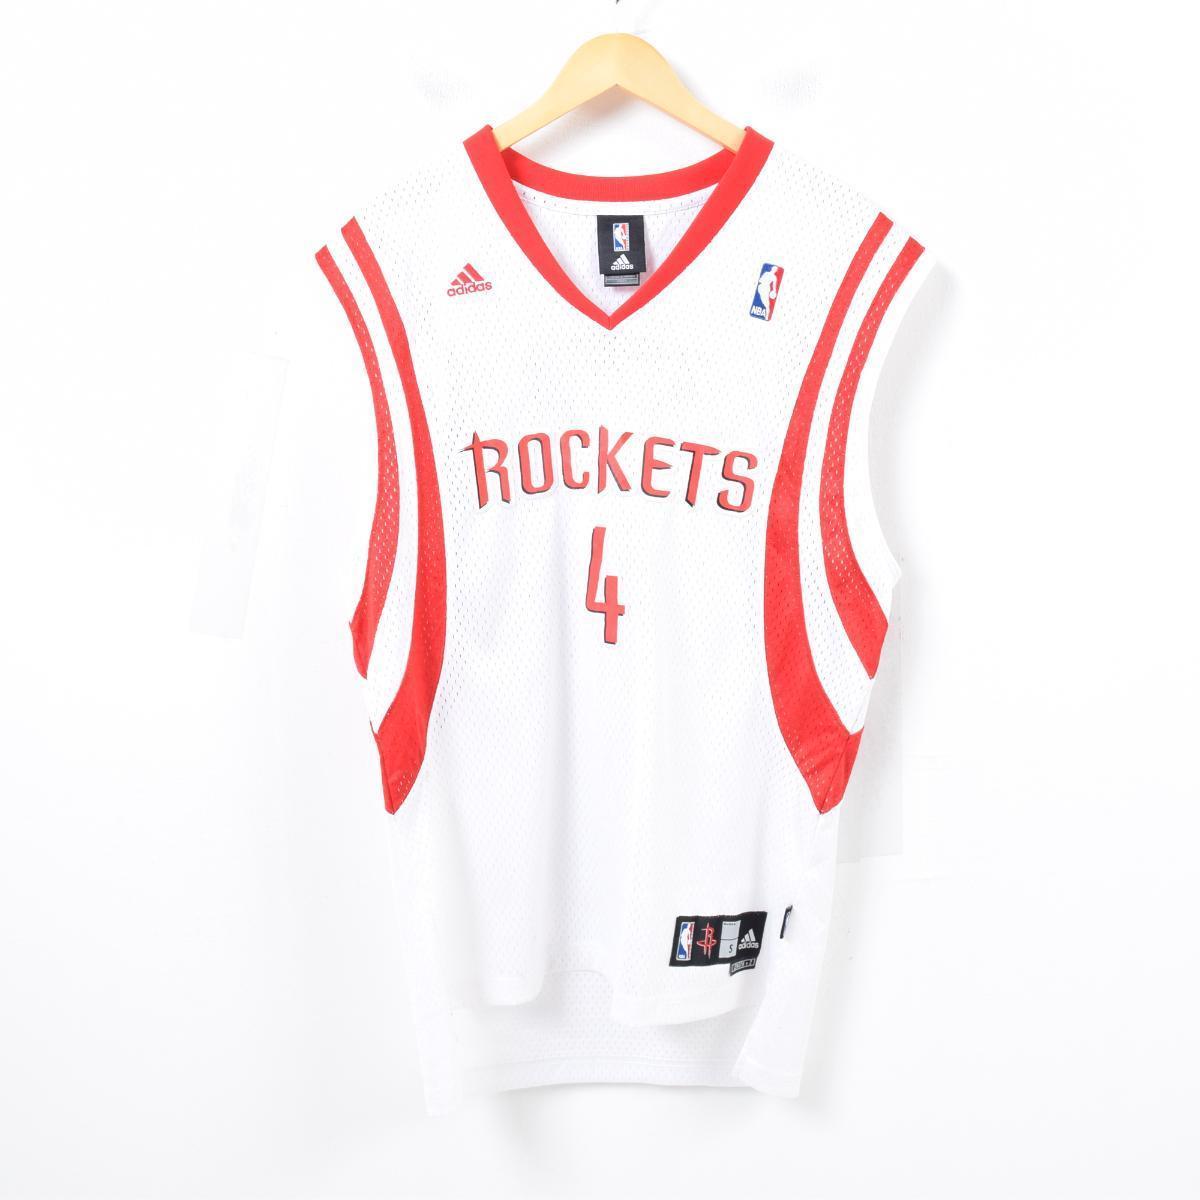 innovative design 33eb0 03272 Adidas adidas NBA HOUSTON ROCKETS Houston Rockets Lewis's Colla game shirt  replica uniform men M /was3069